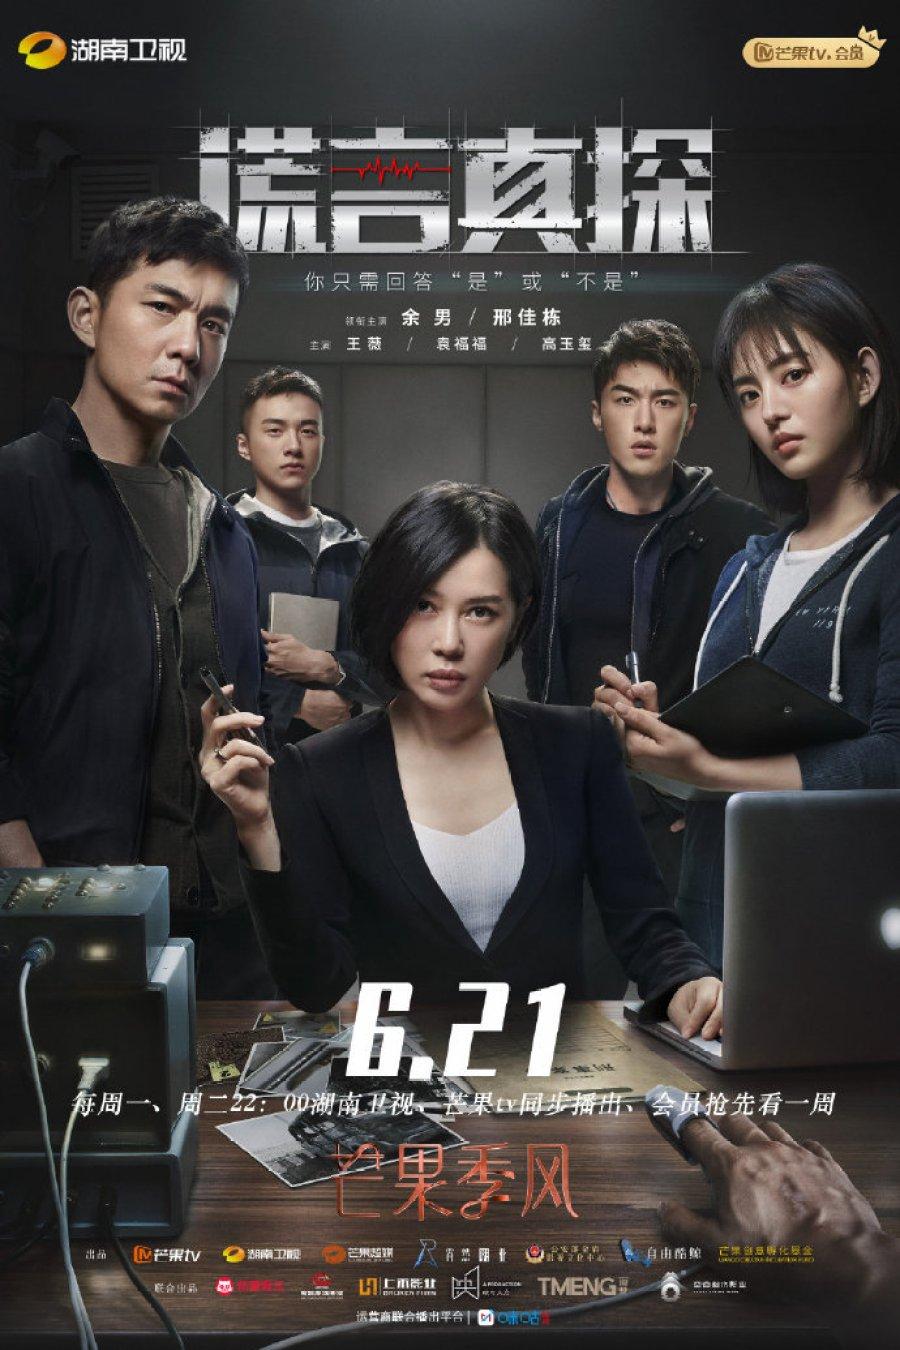 v1vR8 4f - Детектив лжи ✦ 2021 ✦ Китай